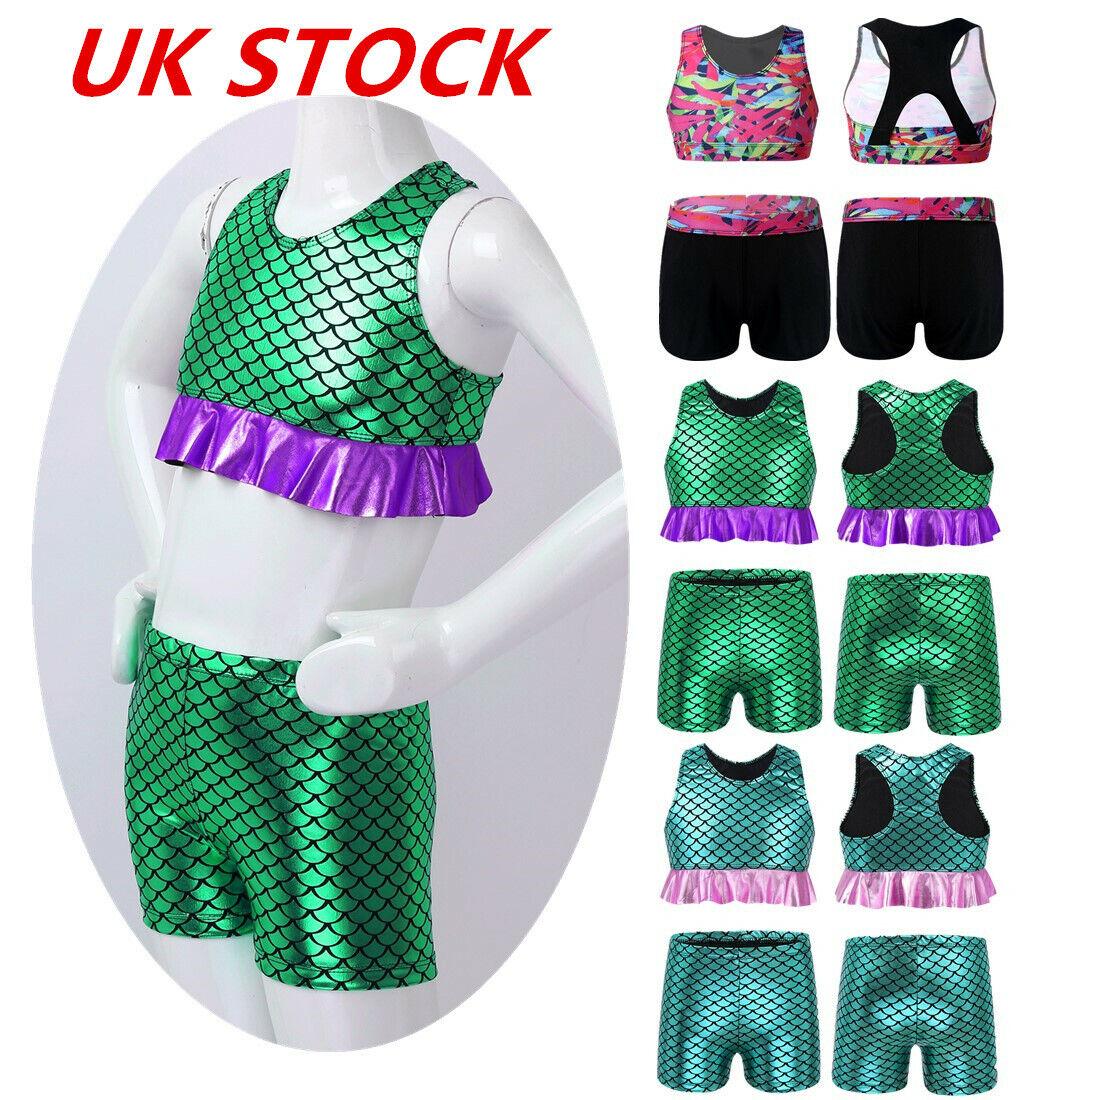 UK Kids Girls Dance Sports Outfit Gymnastics Crop Top Racer Back Shorts Costumes